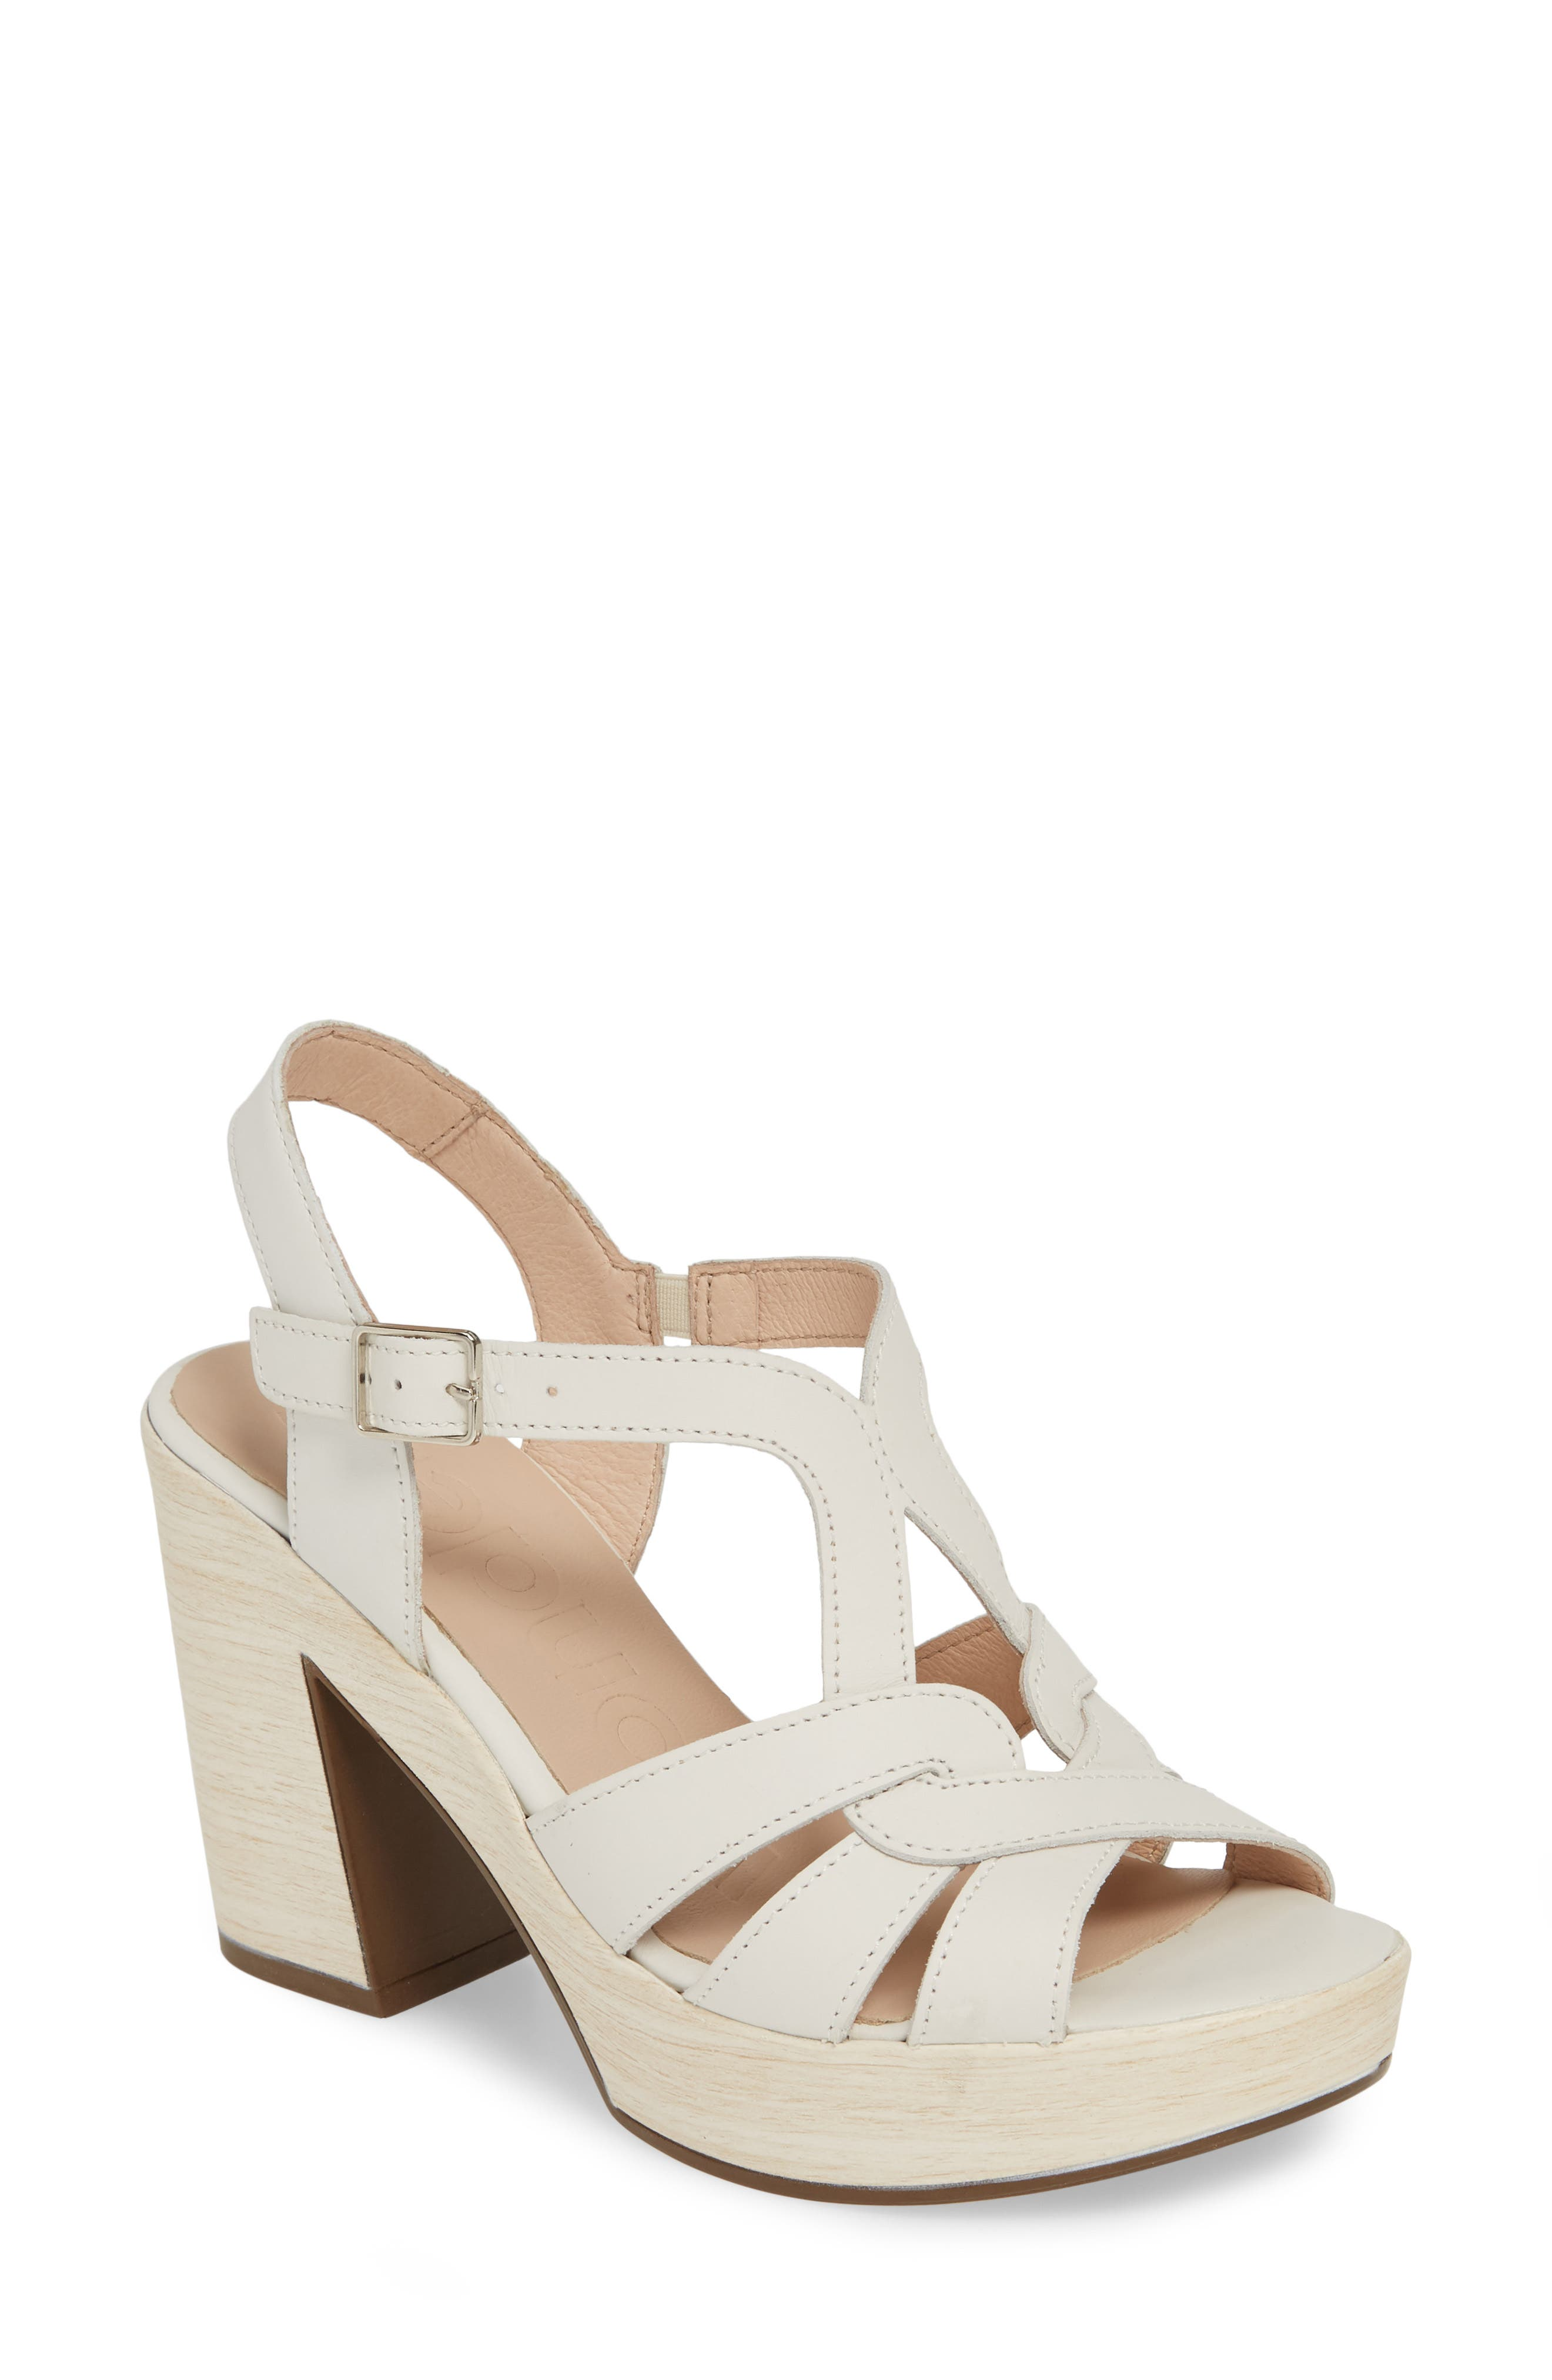 Vintage Sandals   Wedges, Espadrilles – 30s, 40s, 50s, 60s, 70s Womens Wonders Block Heel Sandal Size 9.5-10US  41EU - White $209.95 AT vintagedancer.com